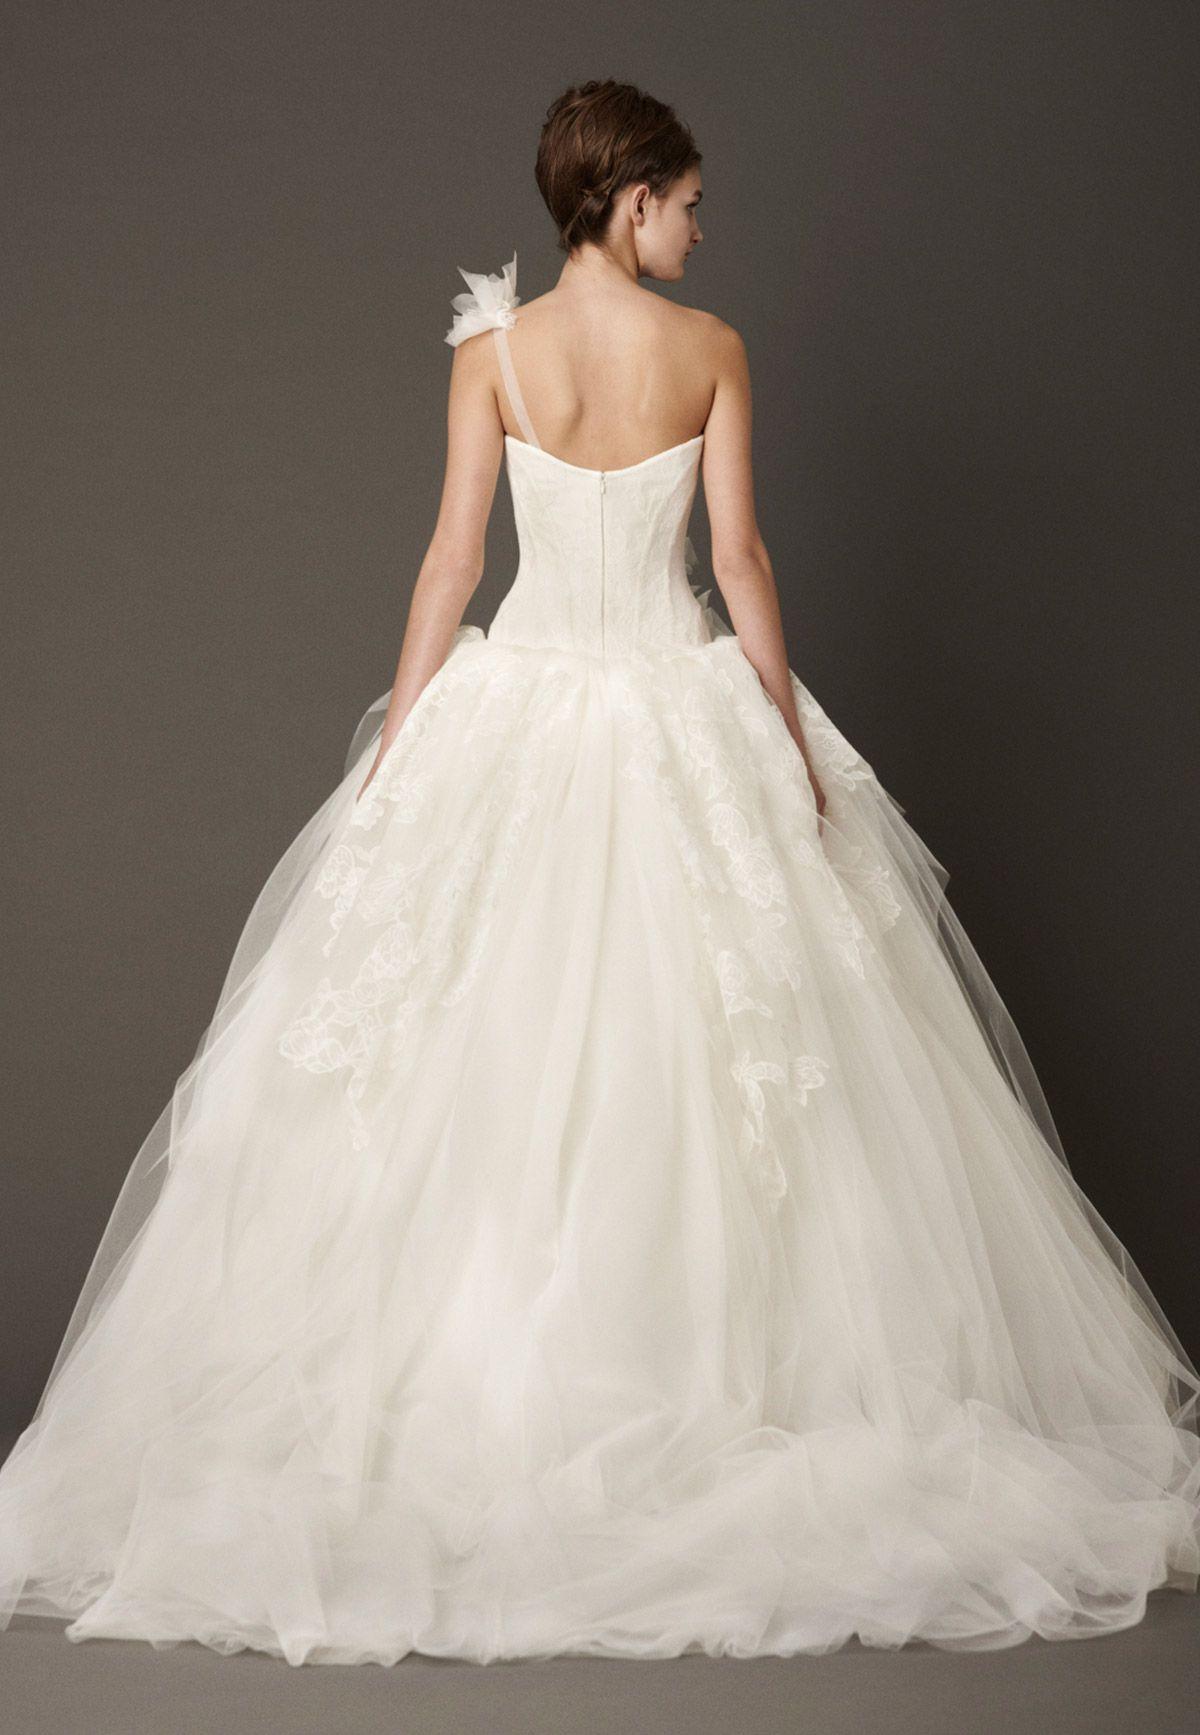 Vera wang designer wedding dresses  Vera Wang Fall  Back  Wedding  Pinterest  Bridal gowns